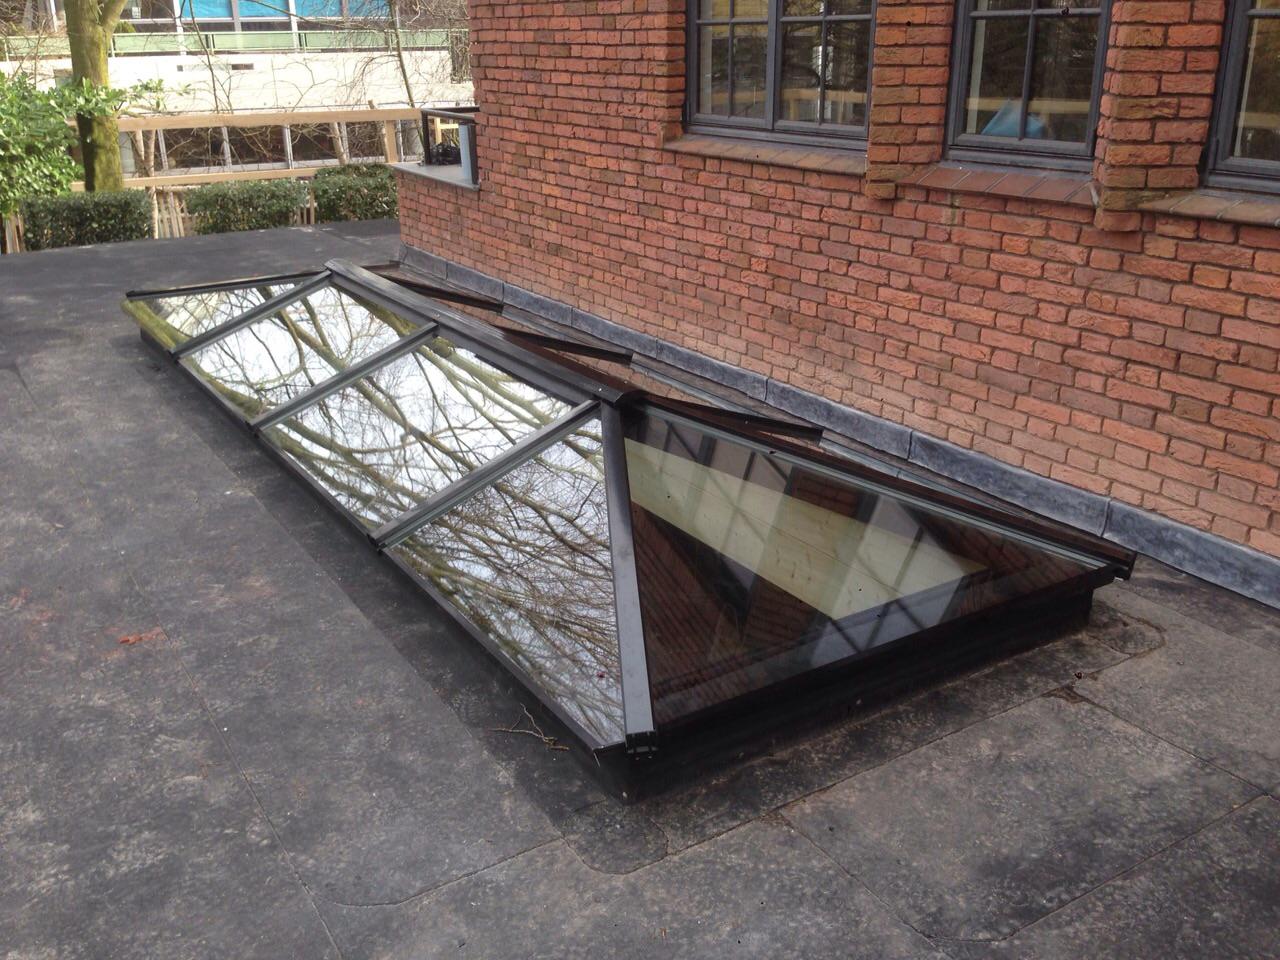 Zwarte Lichtstraat schilddak Jan de Bouvrie op plat dak.